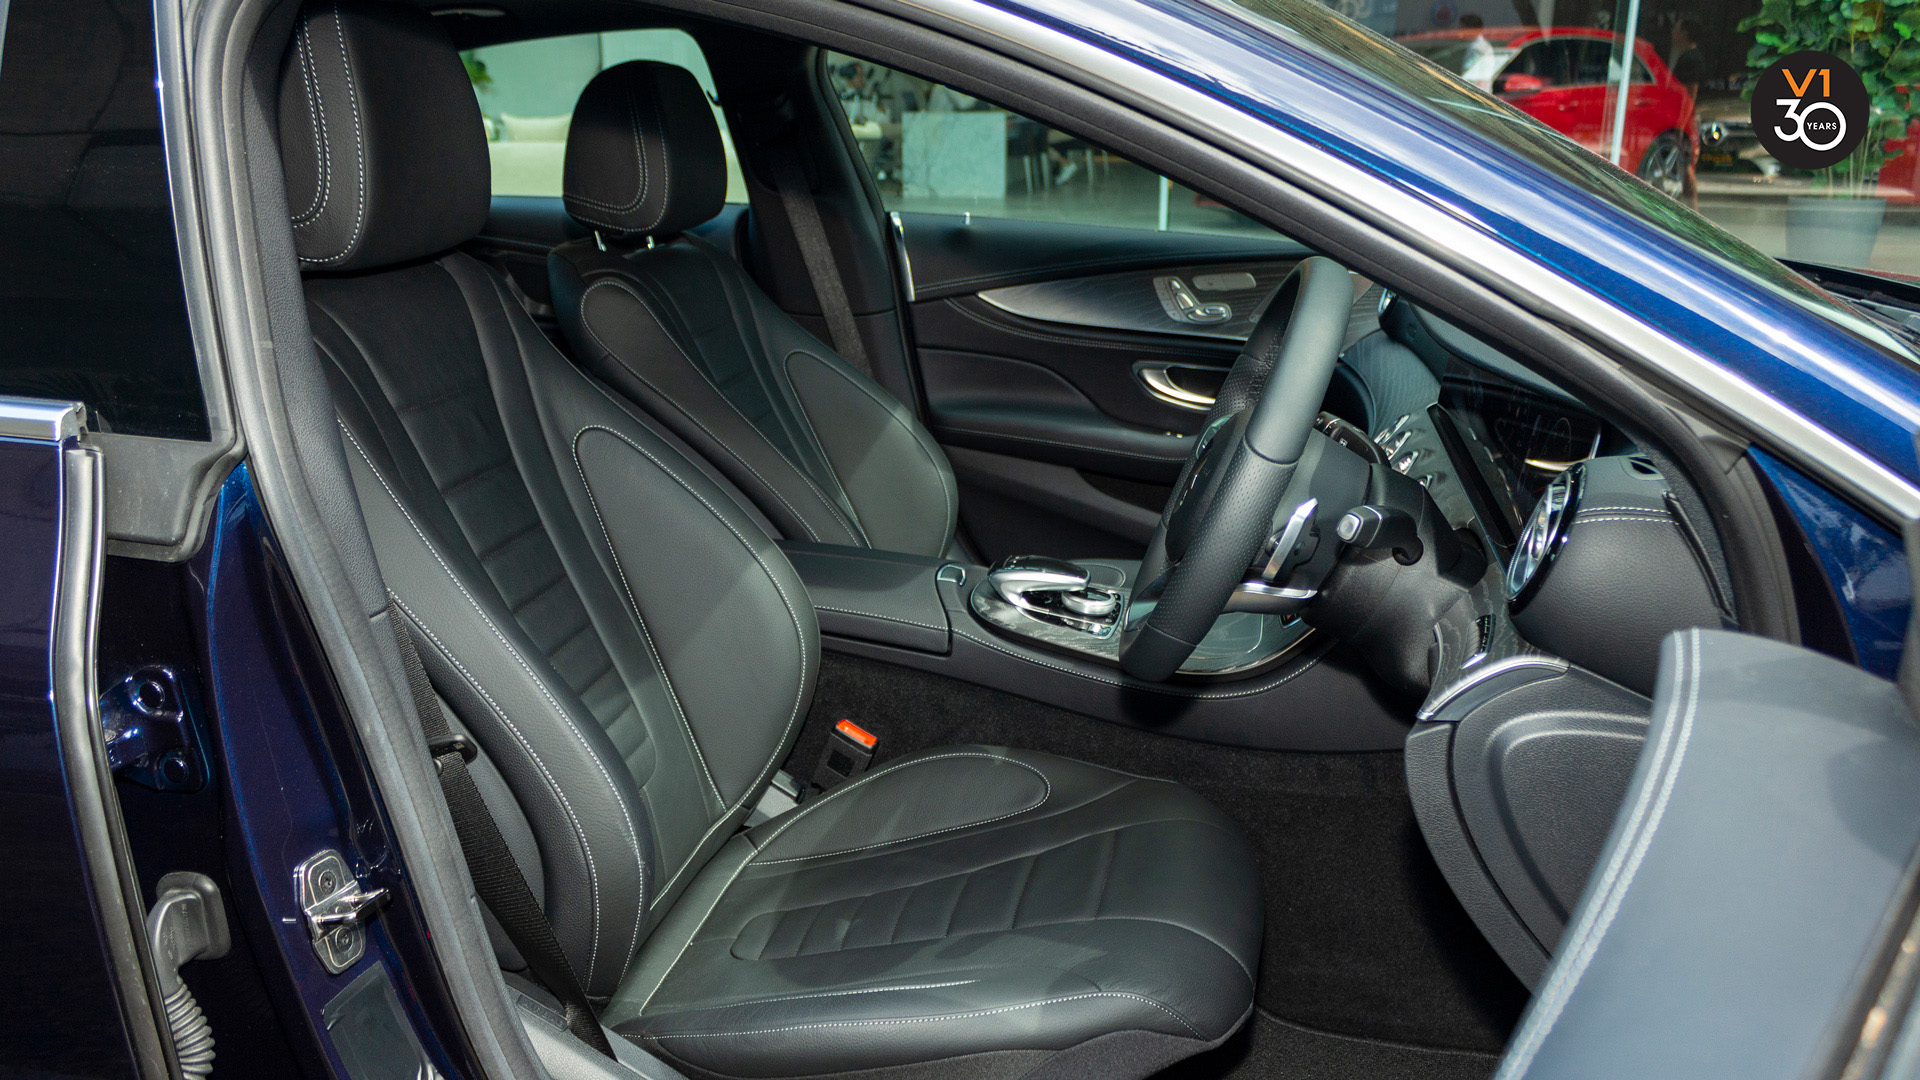 Mercedes-Benz CLS450 AMG Coupe 4MATIC Premium Plus - Driver Seat